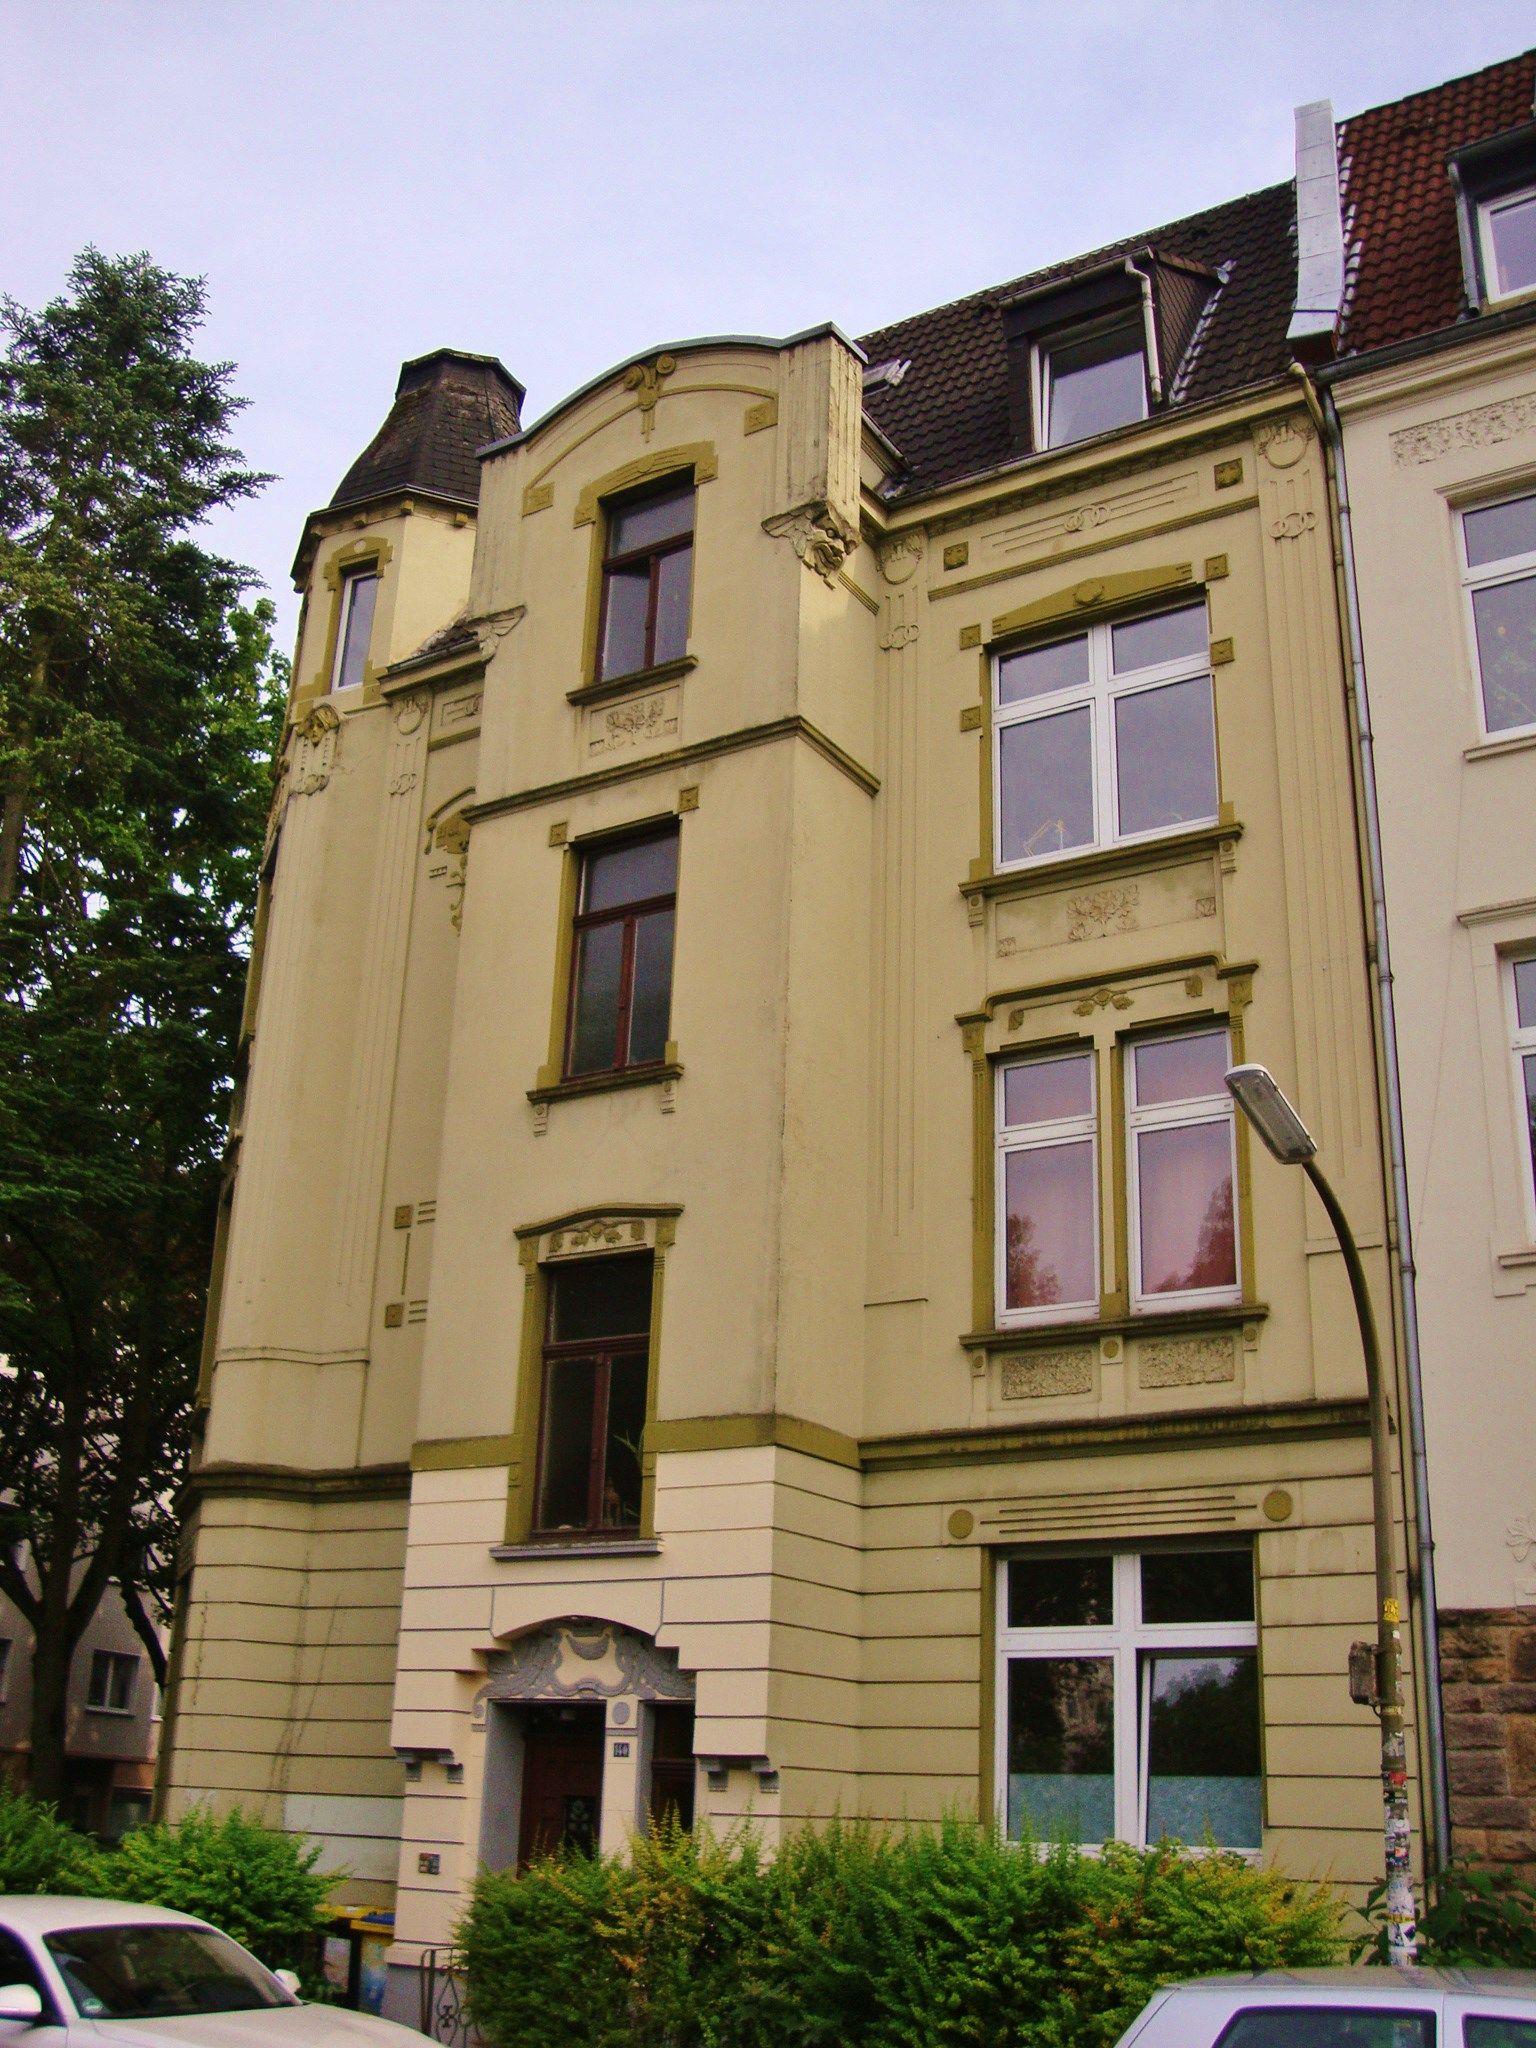 In House Dortmund house at sonnenstr dortmund germany дом на улице солнца дортмунд